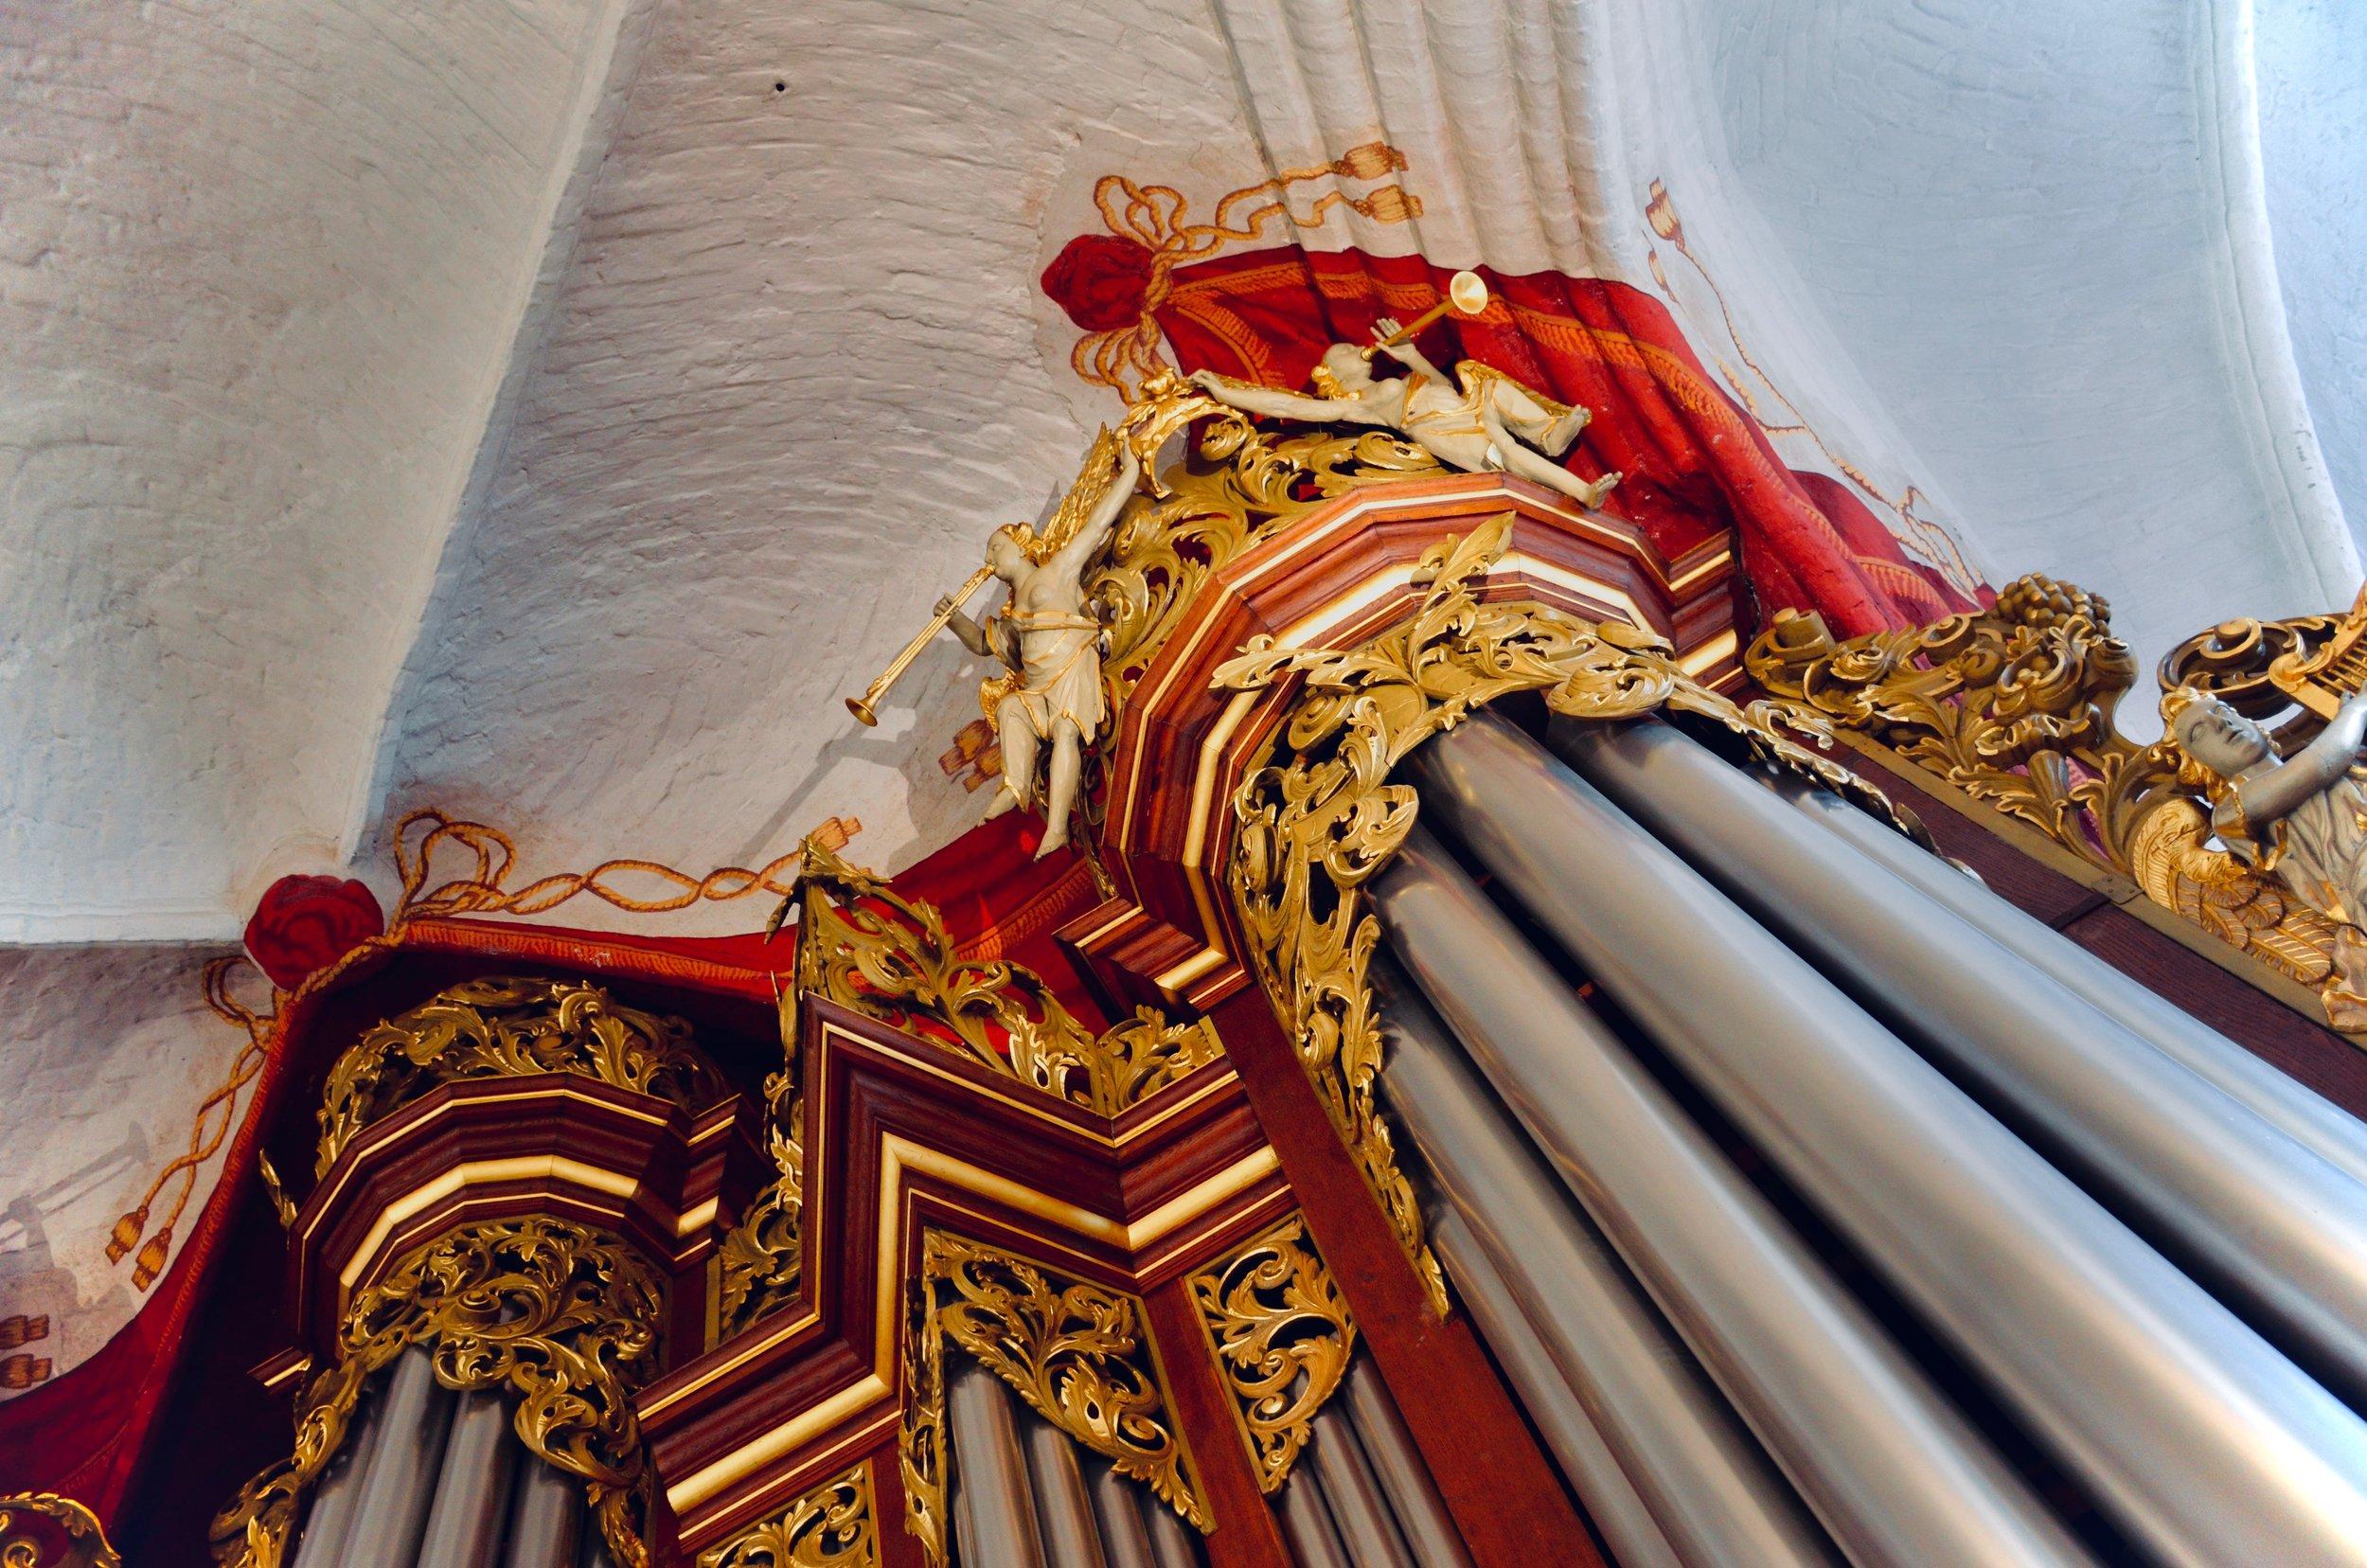 1736 Bielfeldt organ in St. Wilhaldi, Stade. Boston Organ Studio.